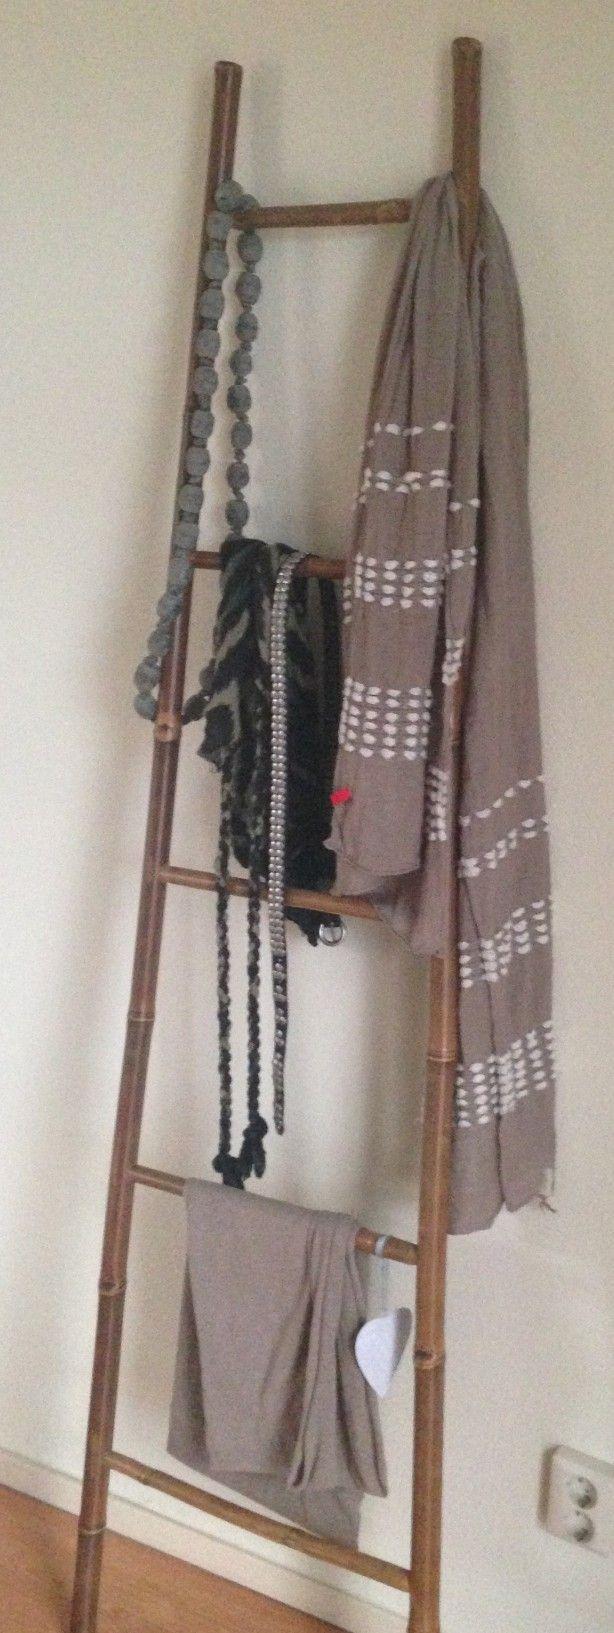 25 beste ideeà n over bamboe ladders op pinterest bamboe bamboe